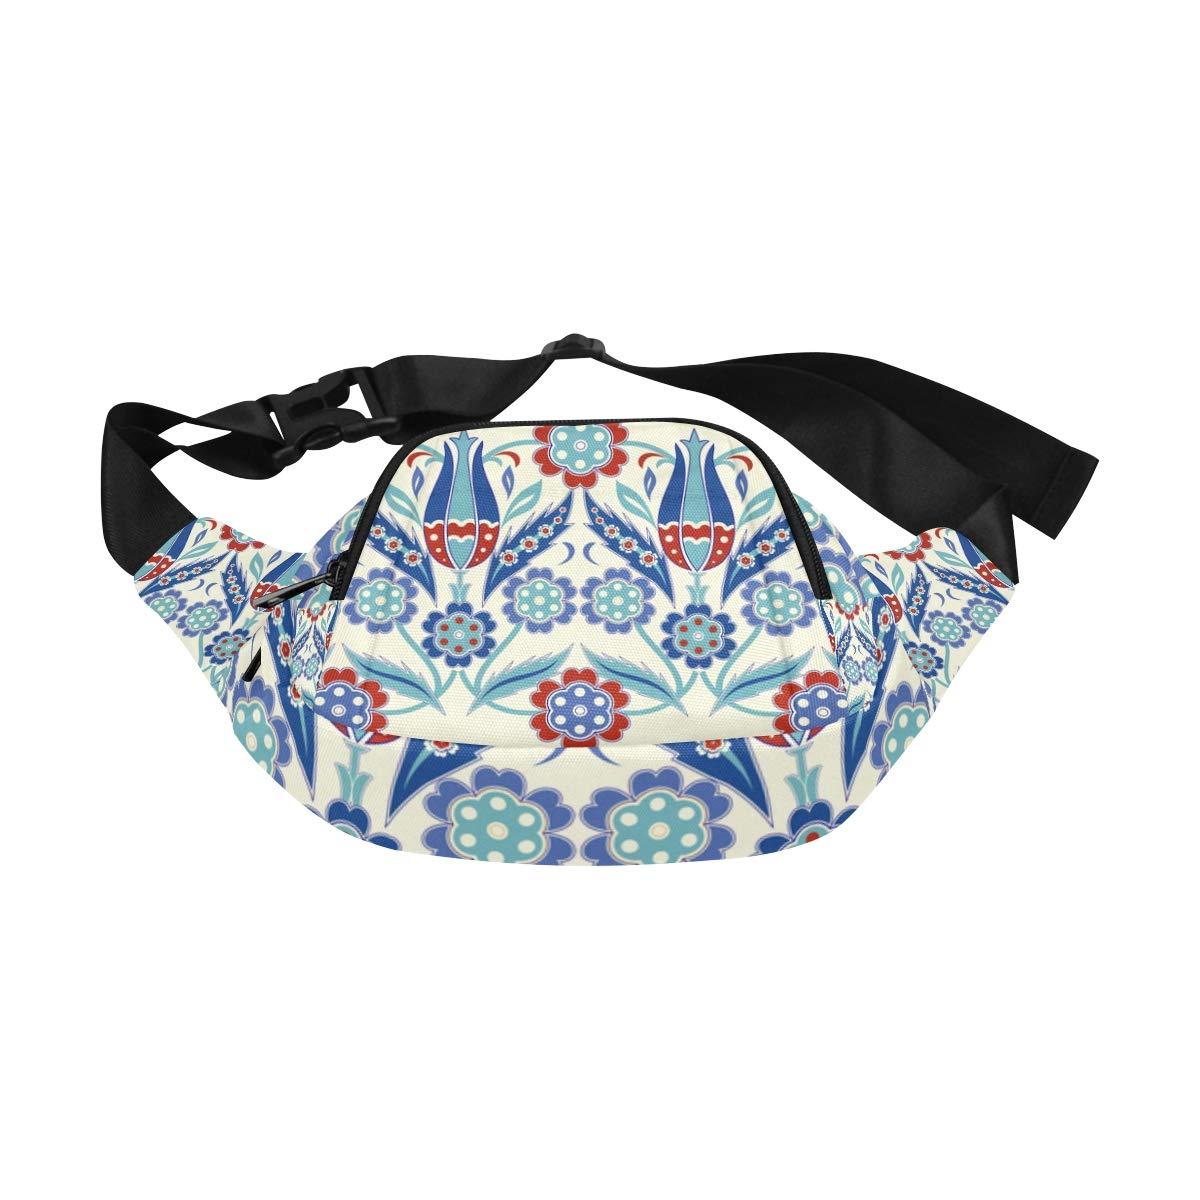 Flowers And Moroccan Tiles Fenny Packs Waist Bags Adjustable Belt Waterproof Nylon Travel Running Sport Vacation Party For Men Women Boys Girls Kids